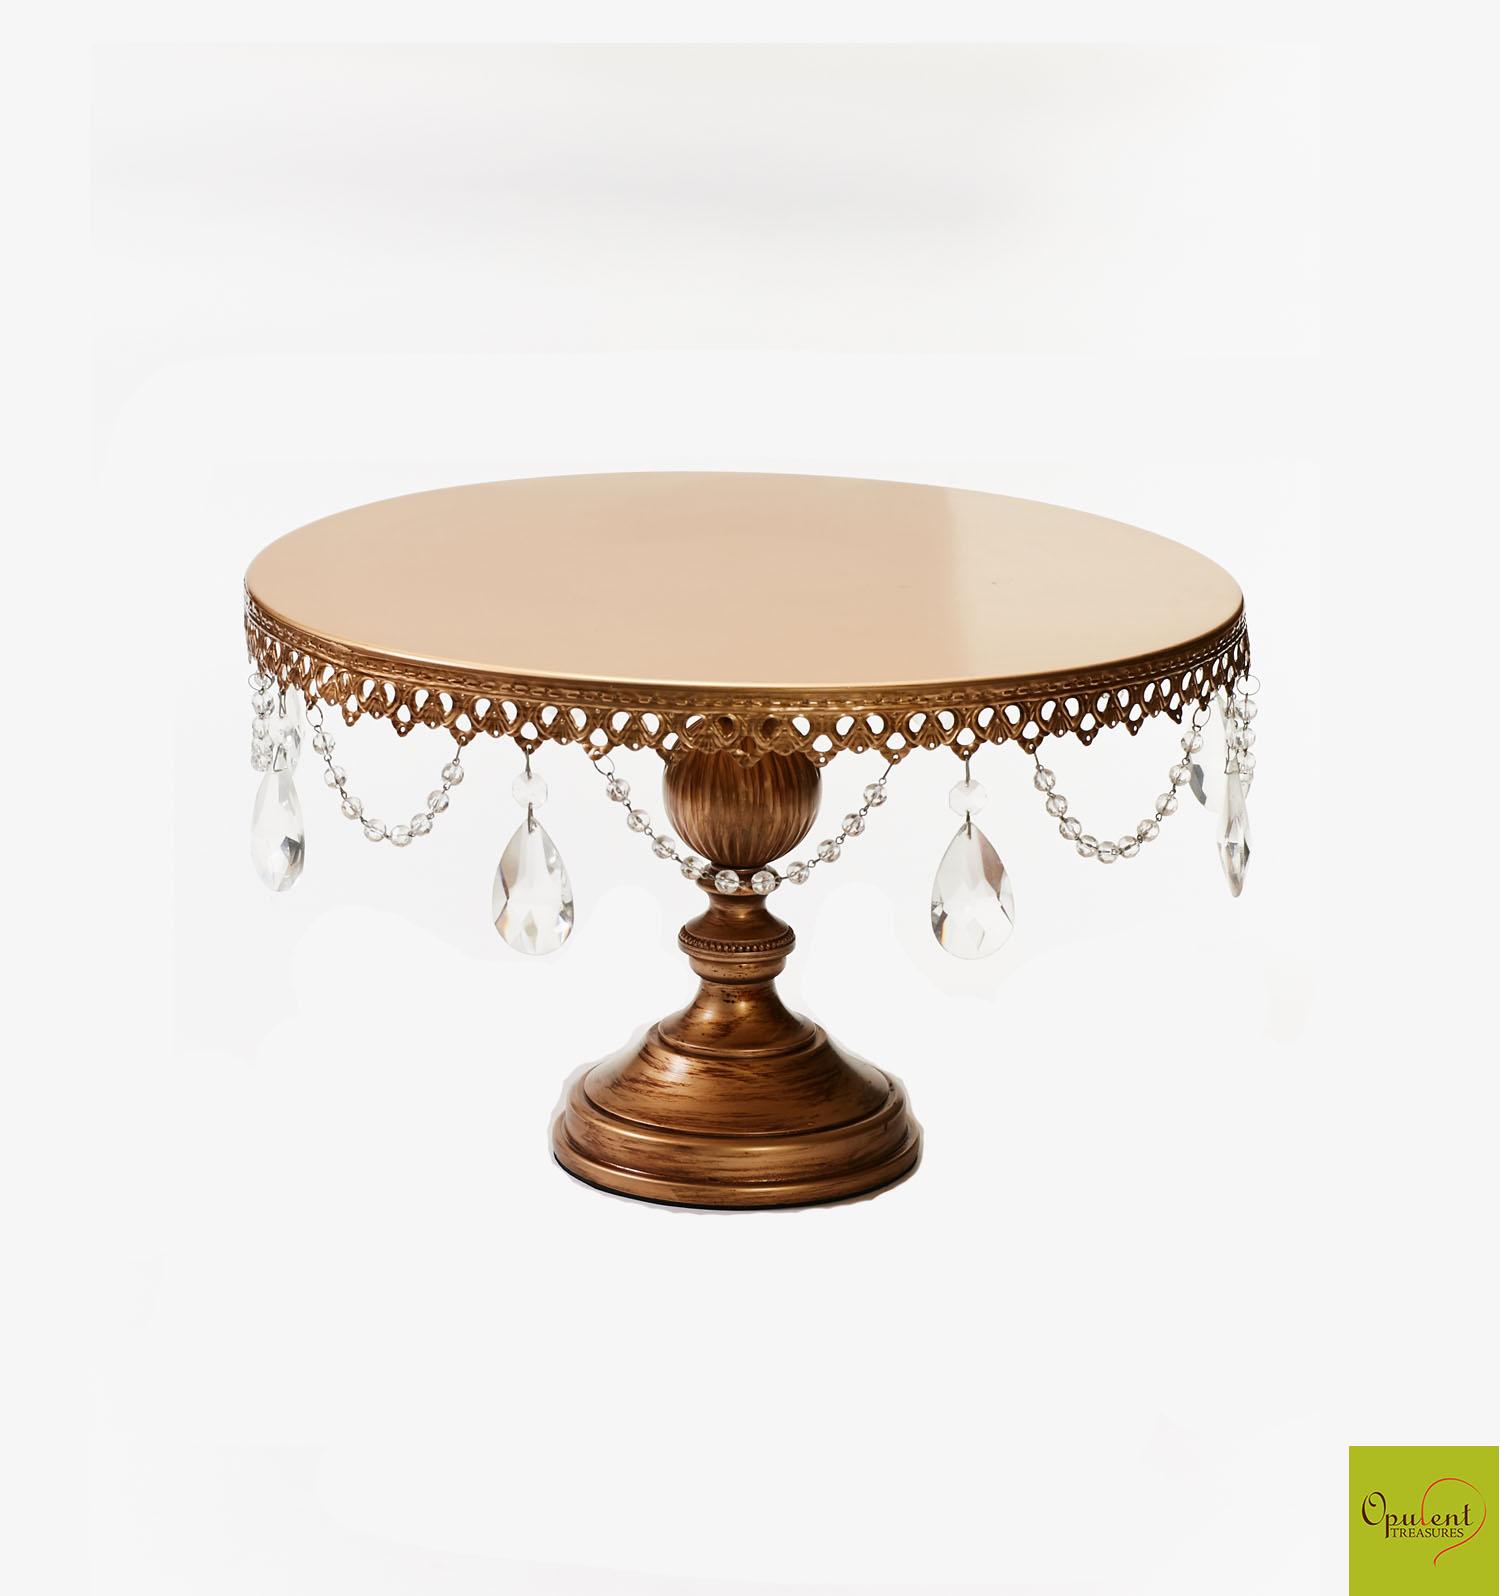 grand round wedding cake stand opulent treasures grand round